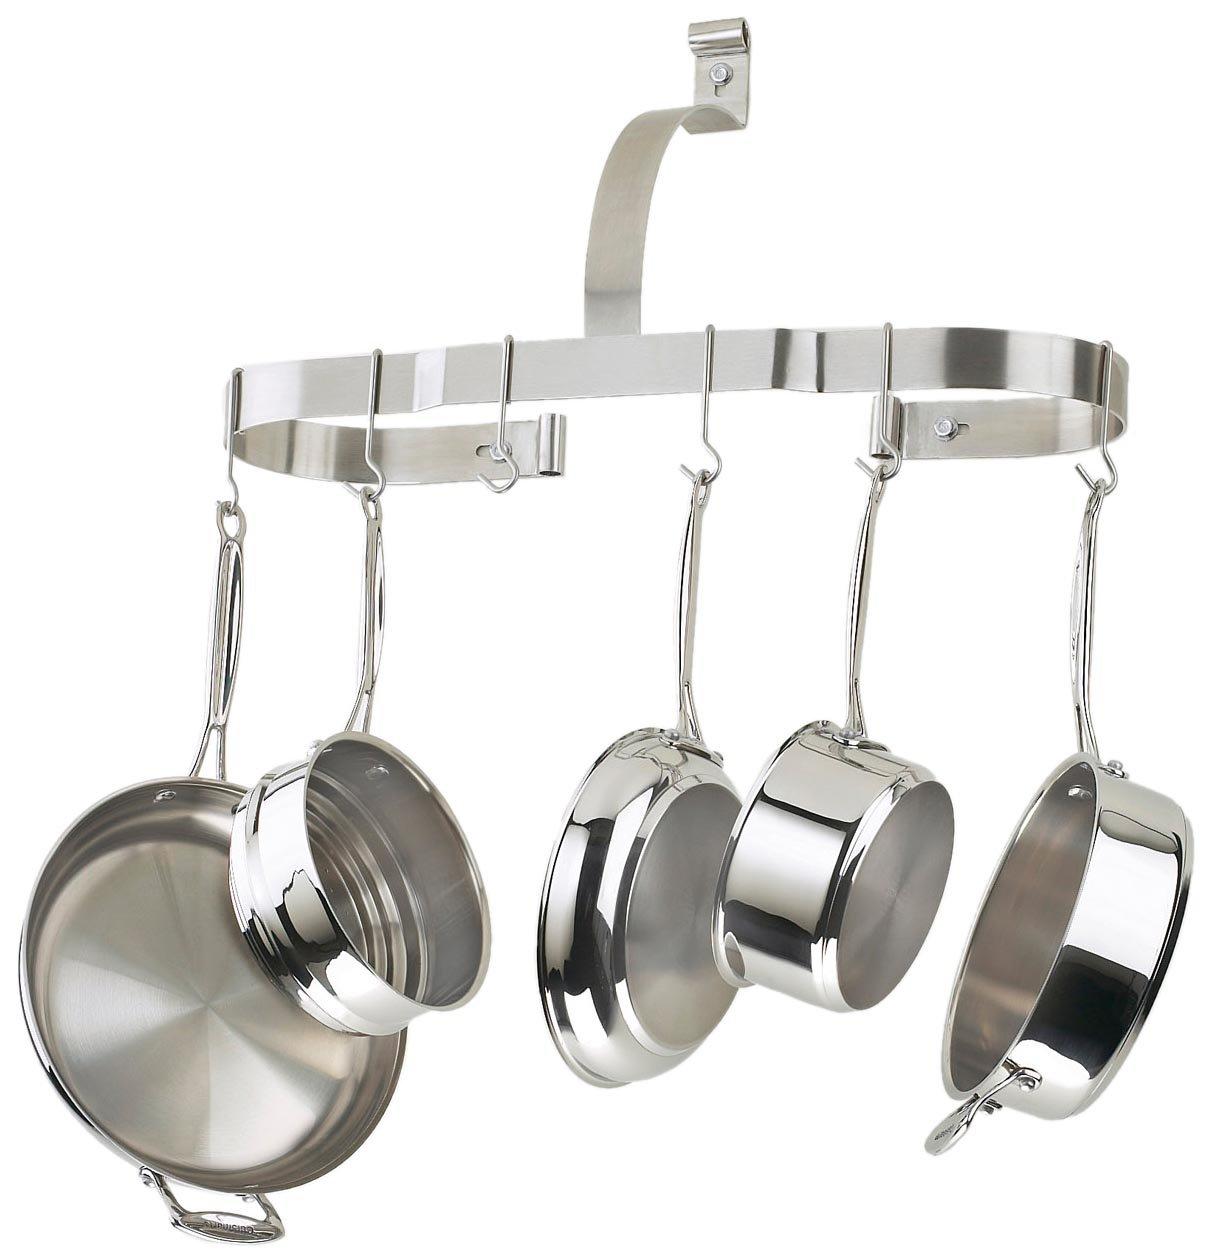 Amazon.com: Cuisinart CROW 25B Oval Cookware Rack: Kitchen Pot Racks:  Kitchen U0026 Dining